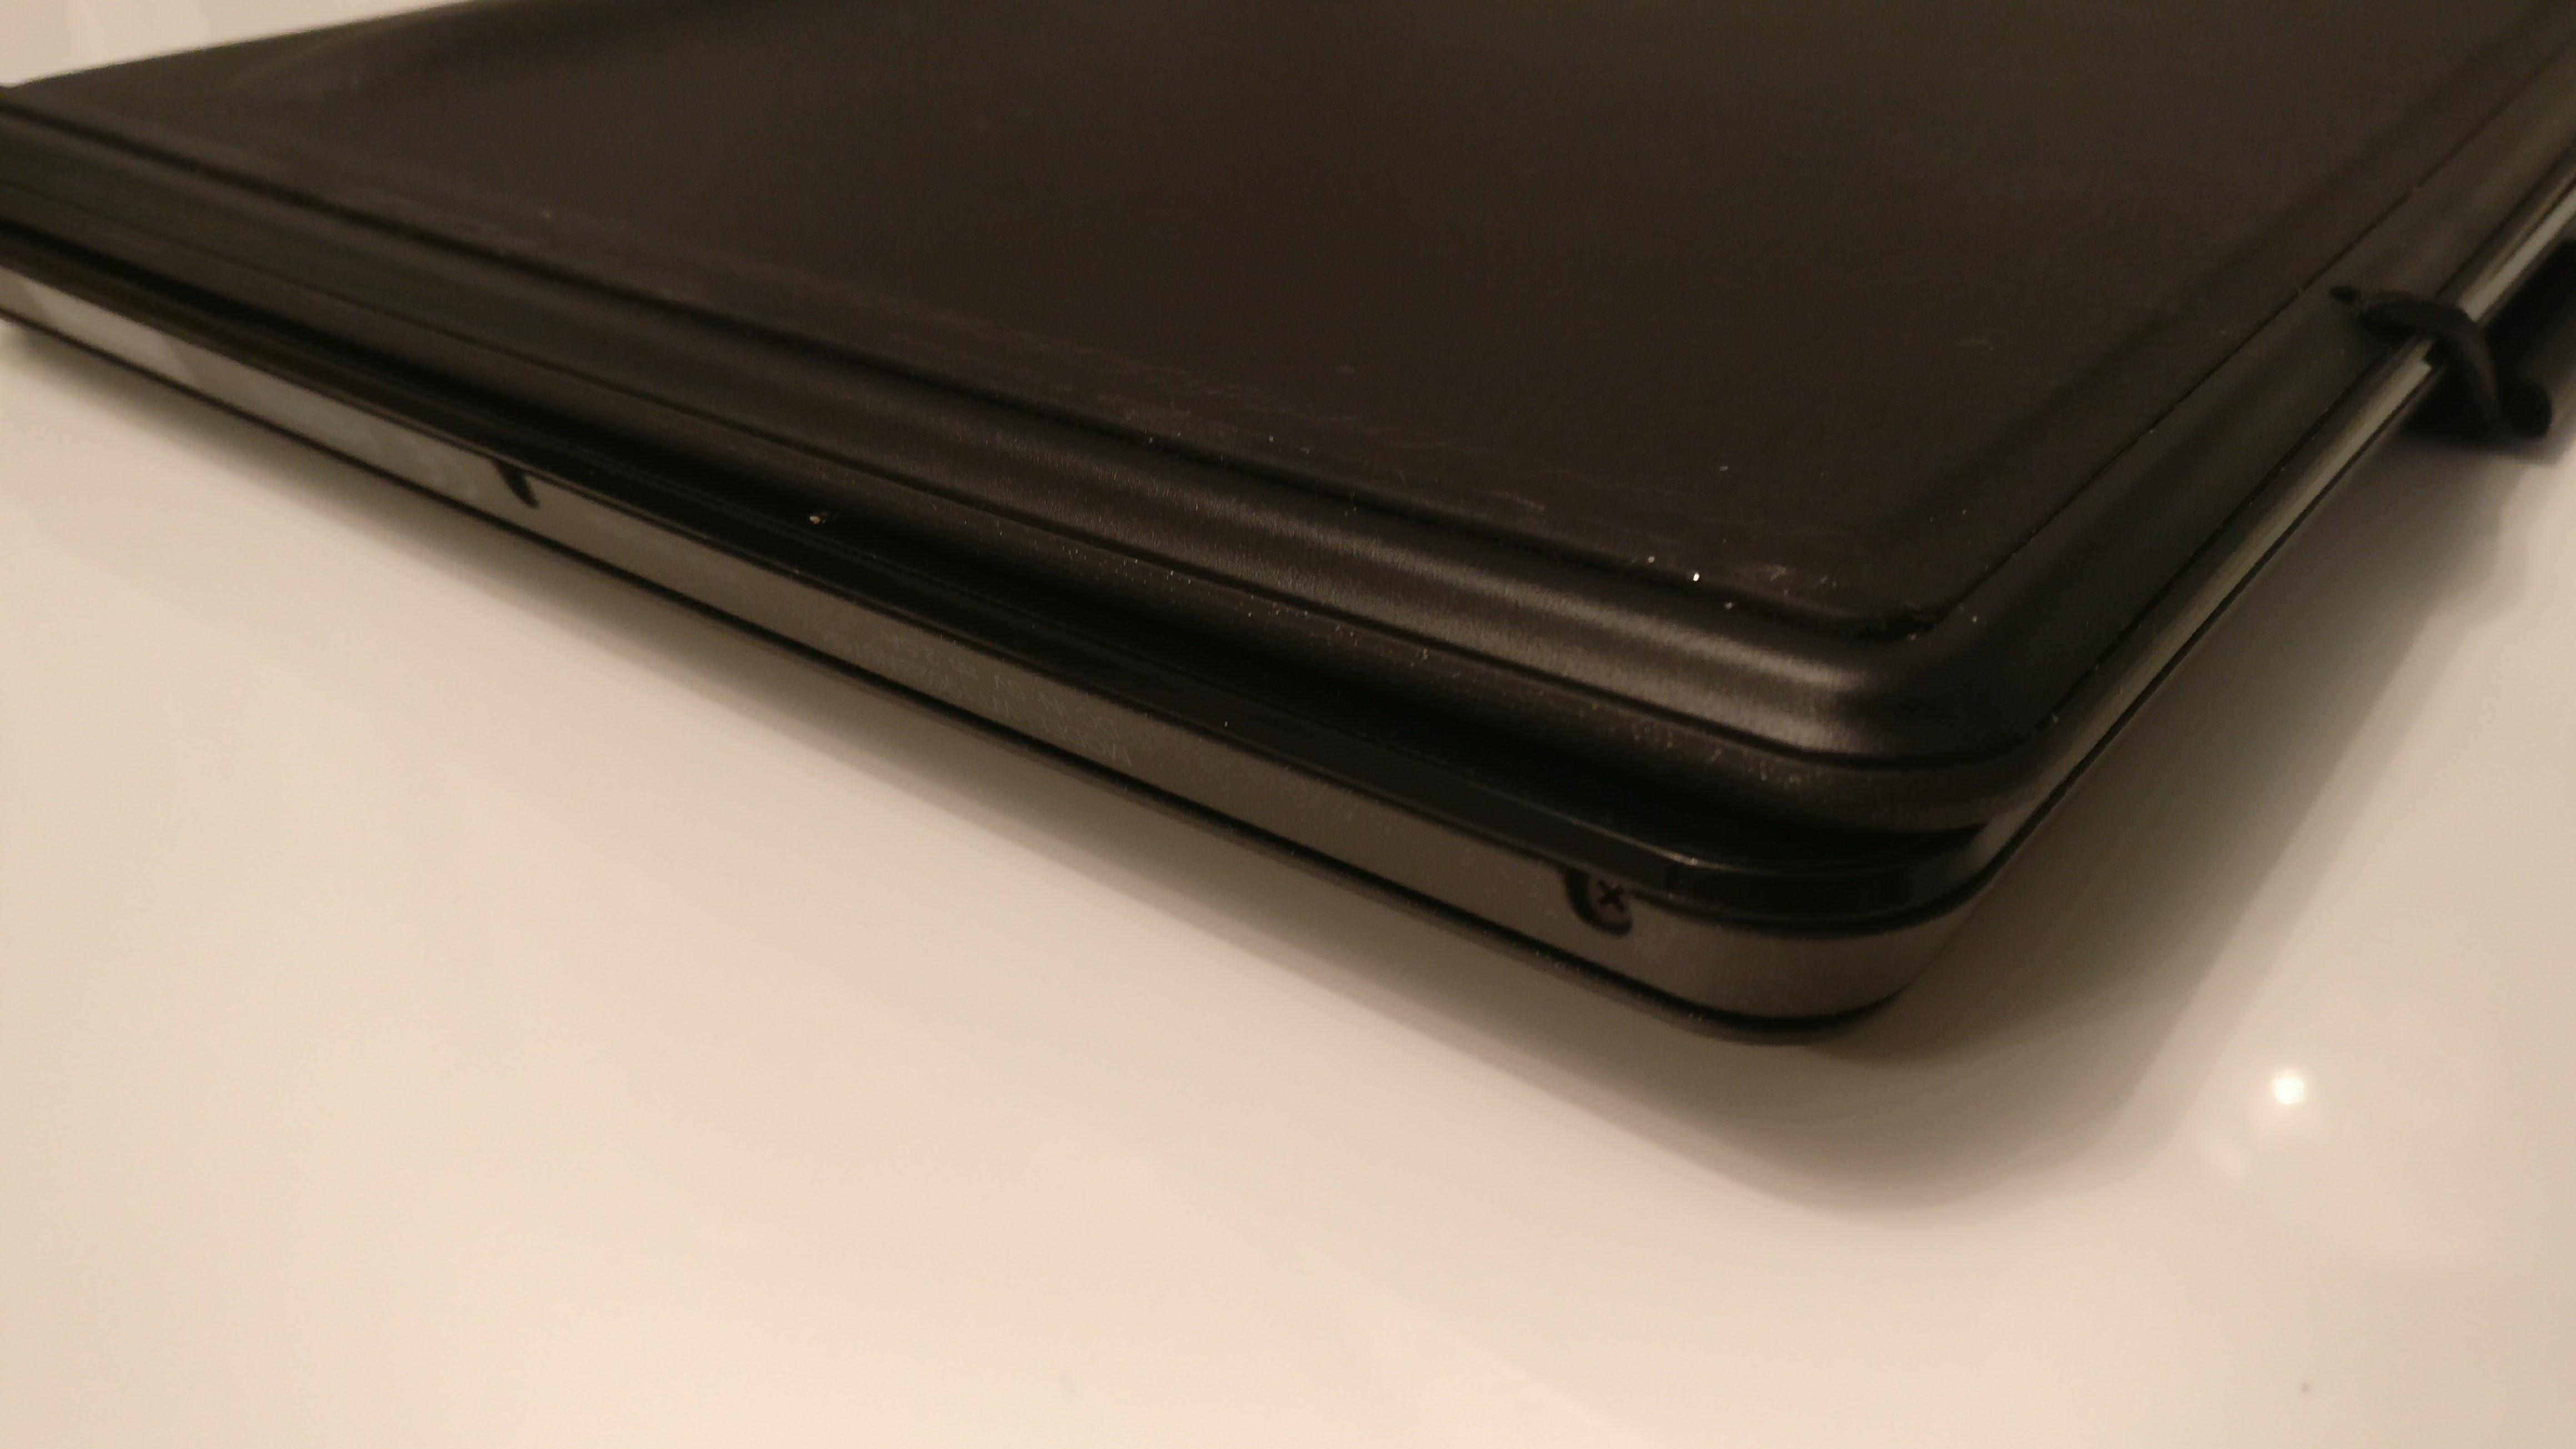 Venturer PrimePro 12 TS 2 in 1 notebook   Review